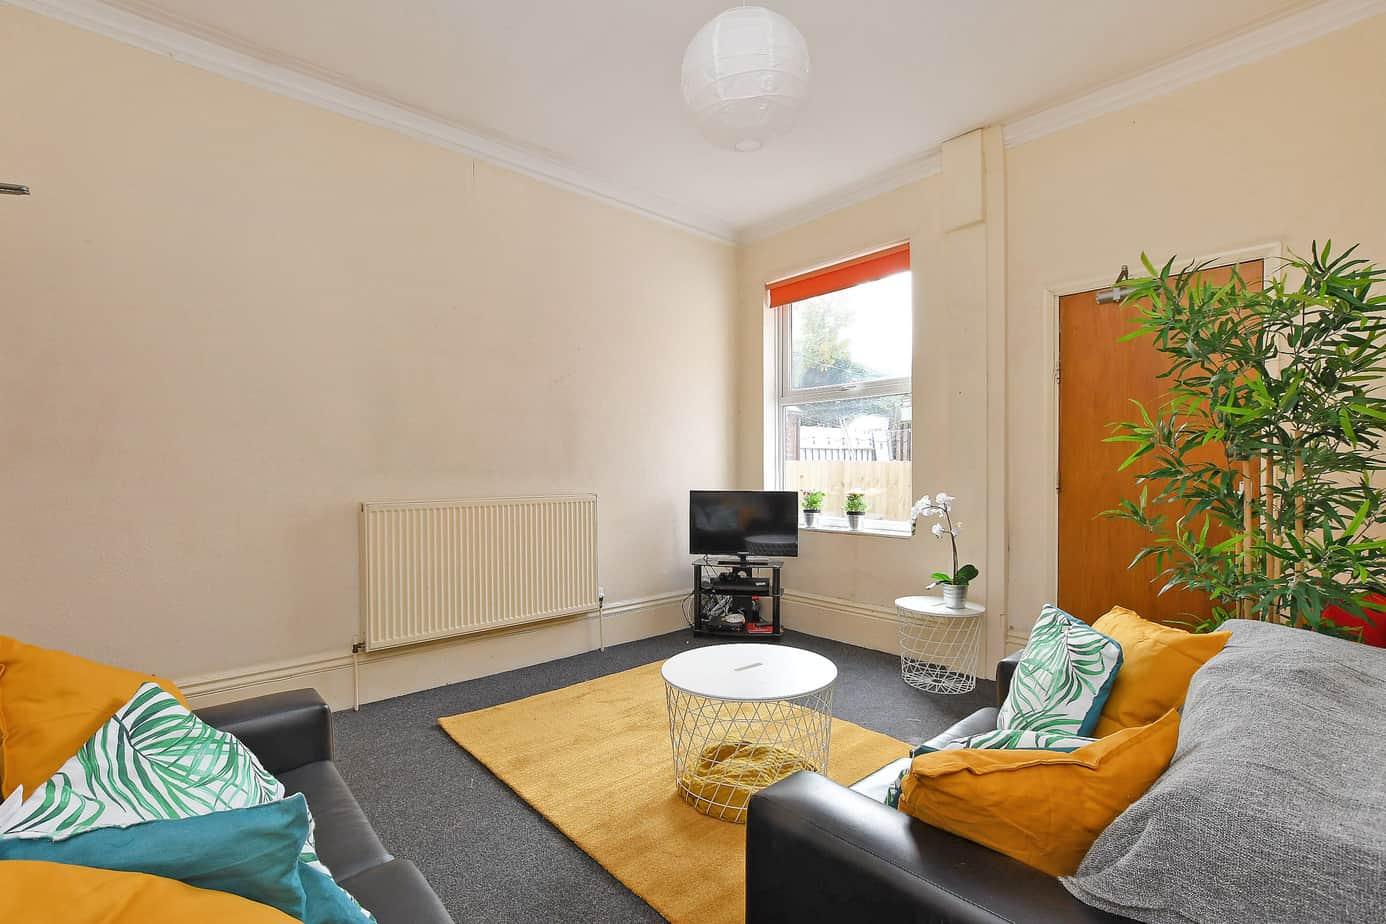 206 Edmund Road – 4 Bed Student Home